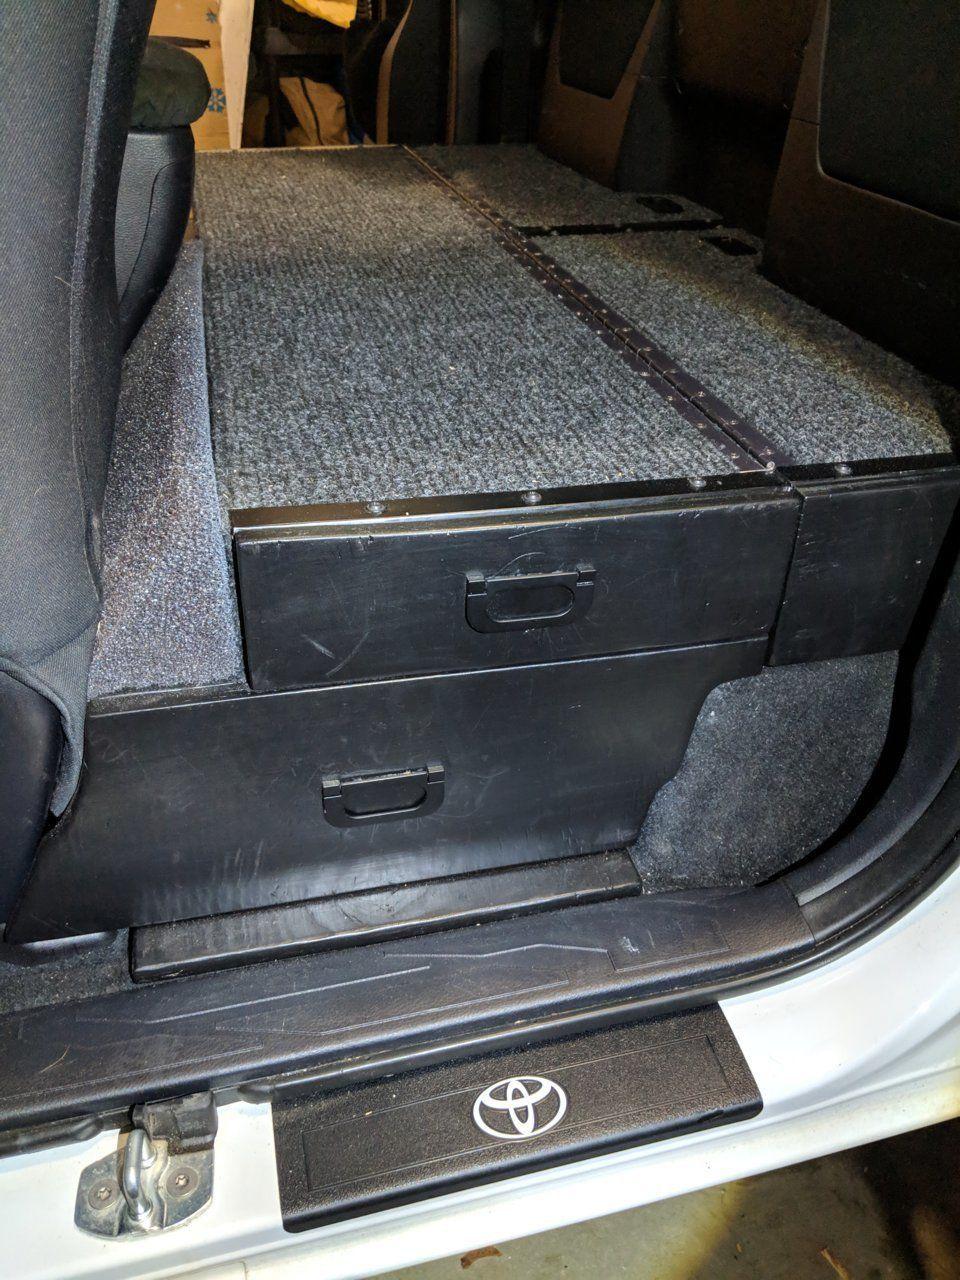 toyota access toyota access cab, toyota